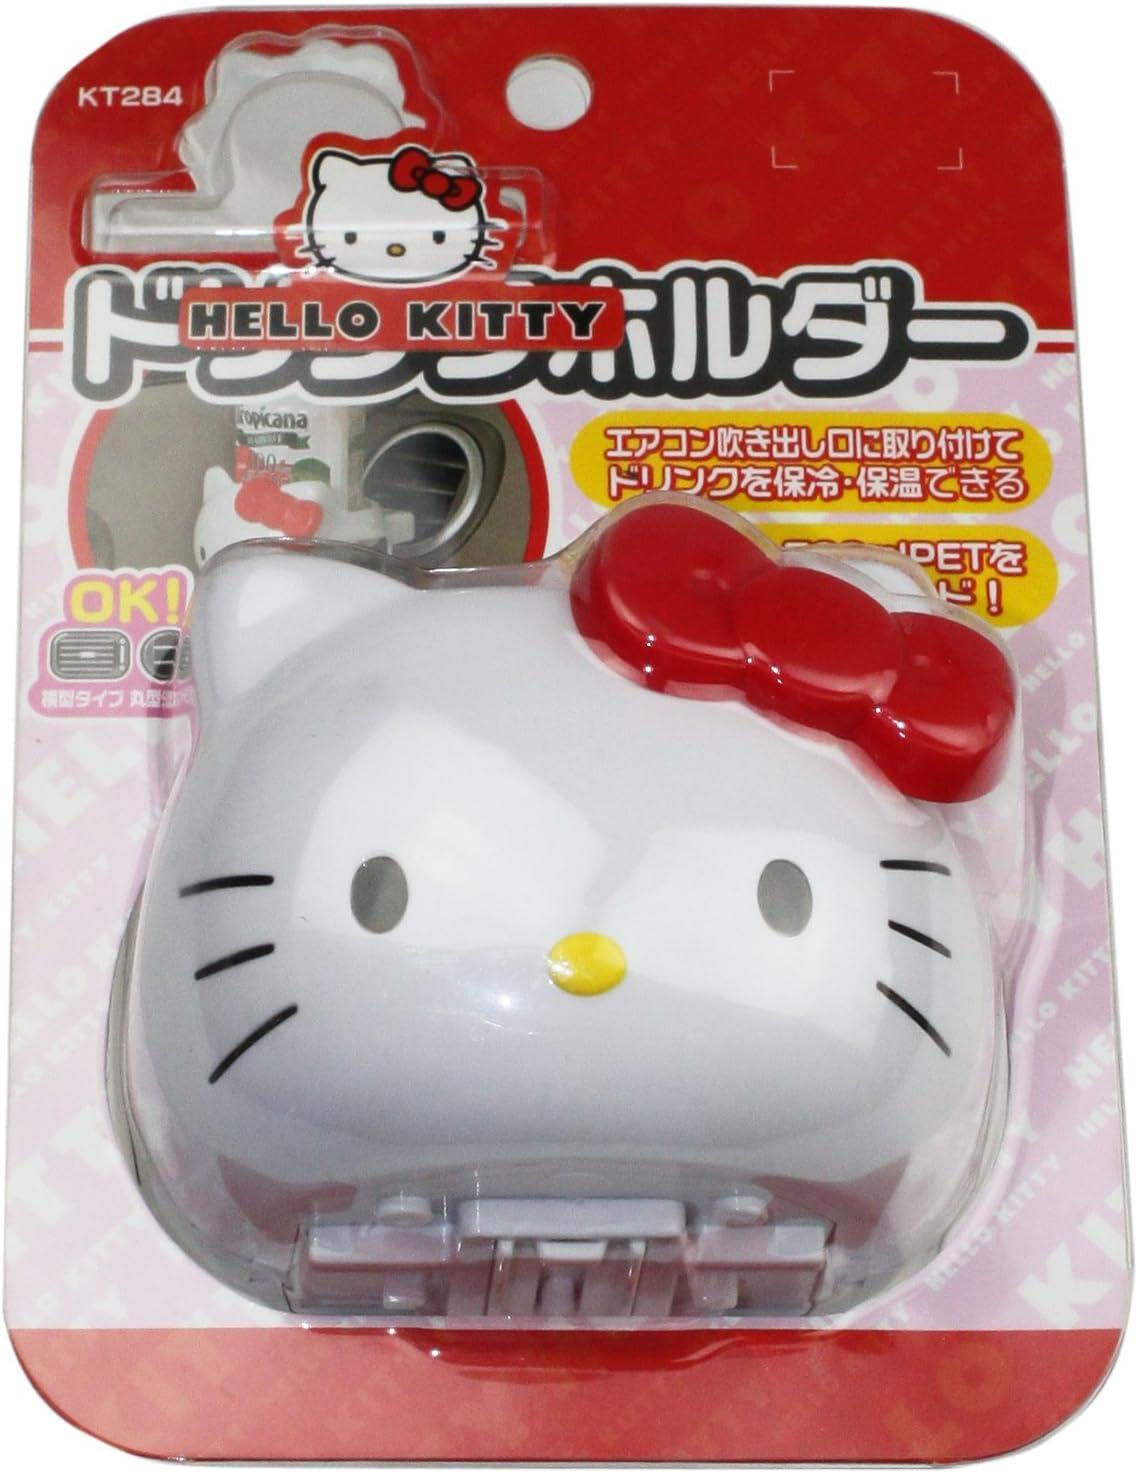 Hello Kitty Face Meter Cap Car Accessory KT441 SEIWA New Japan